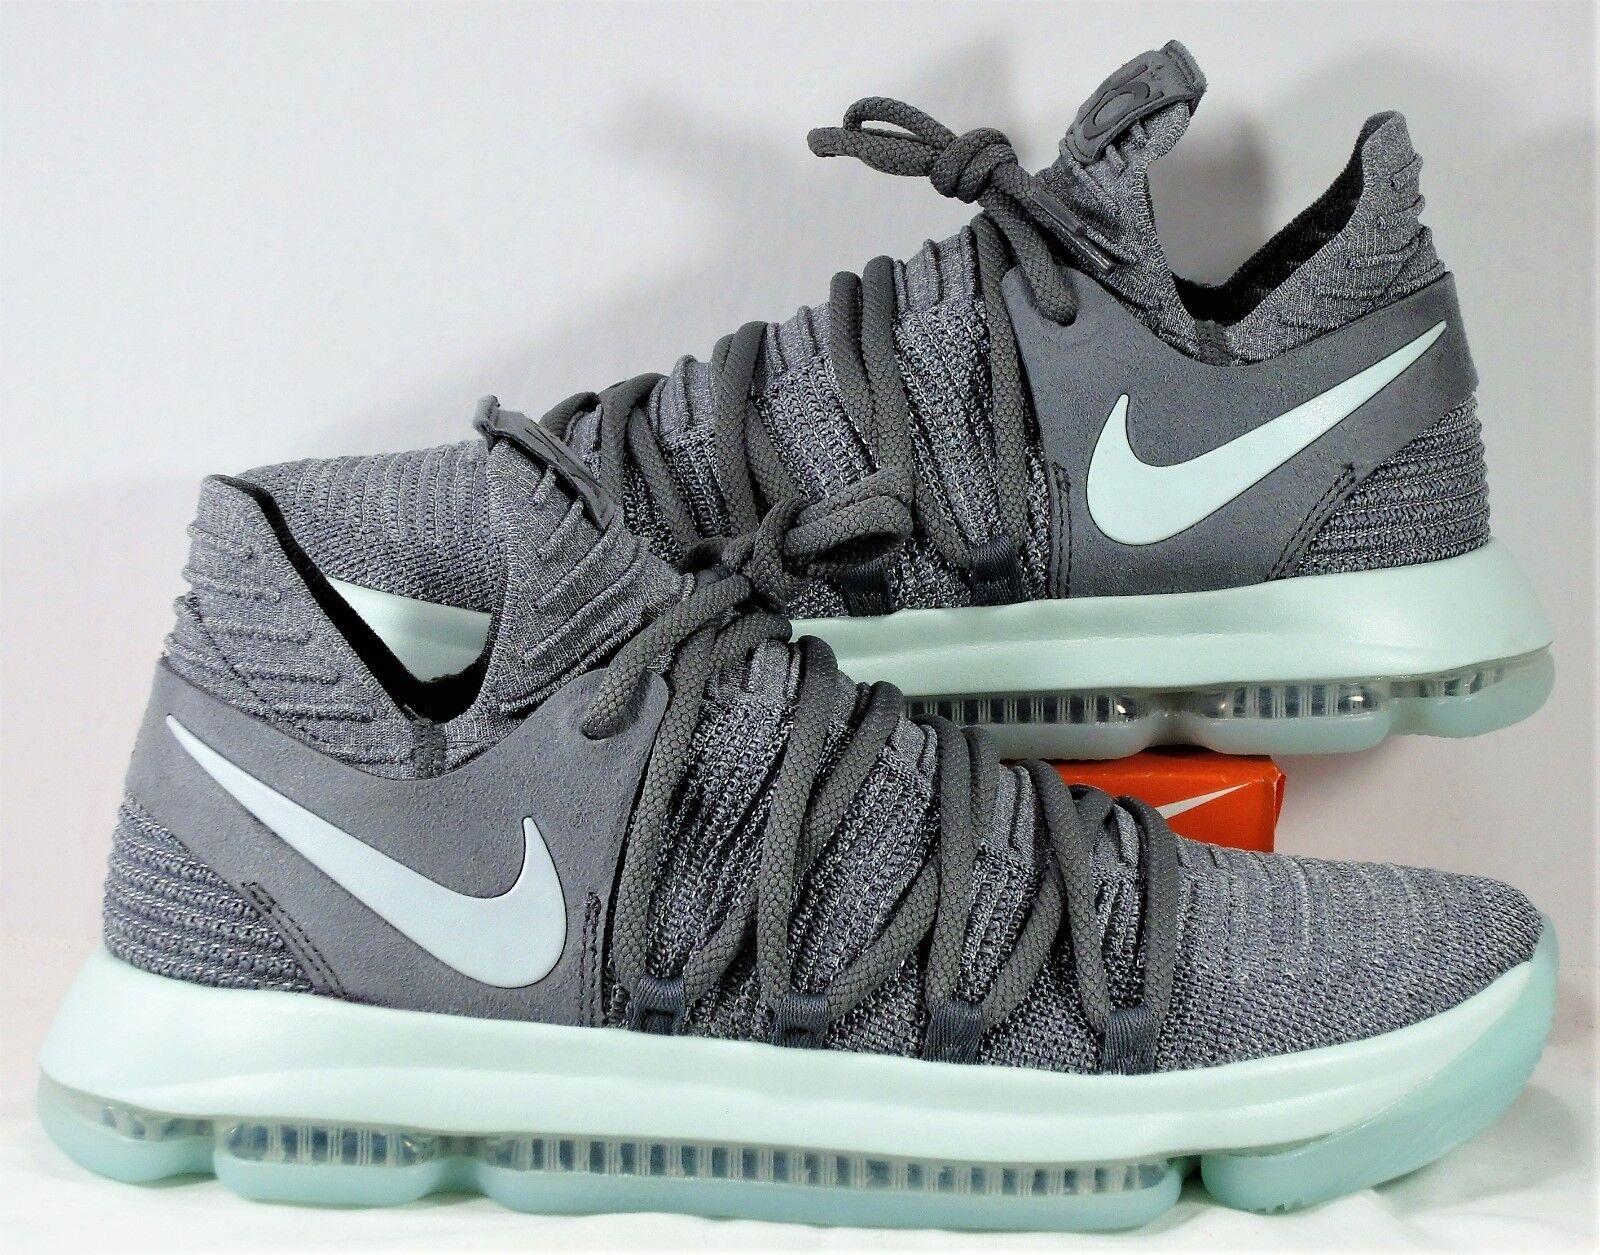 Nike Zoom KD 10 Kevin Durant Cool Grey & Igloo & White Sz 10 NEW 897815 002